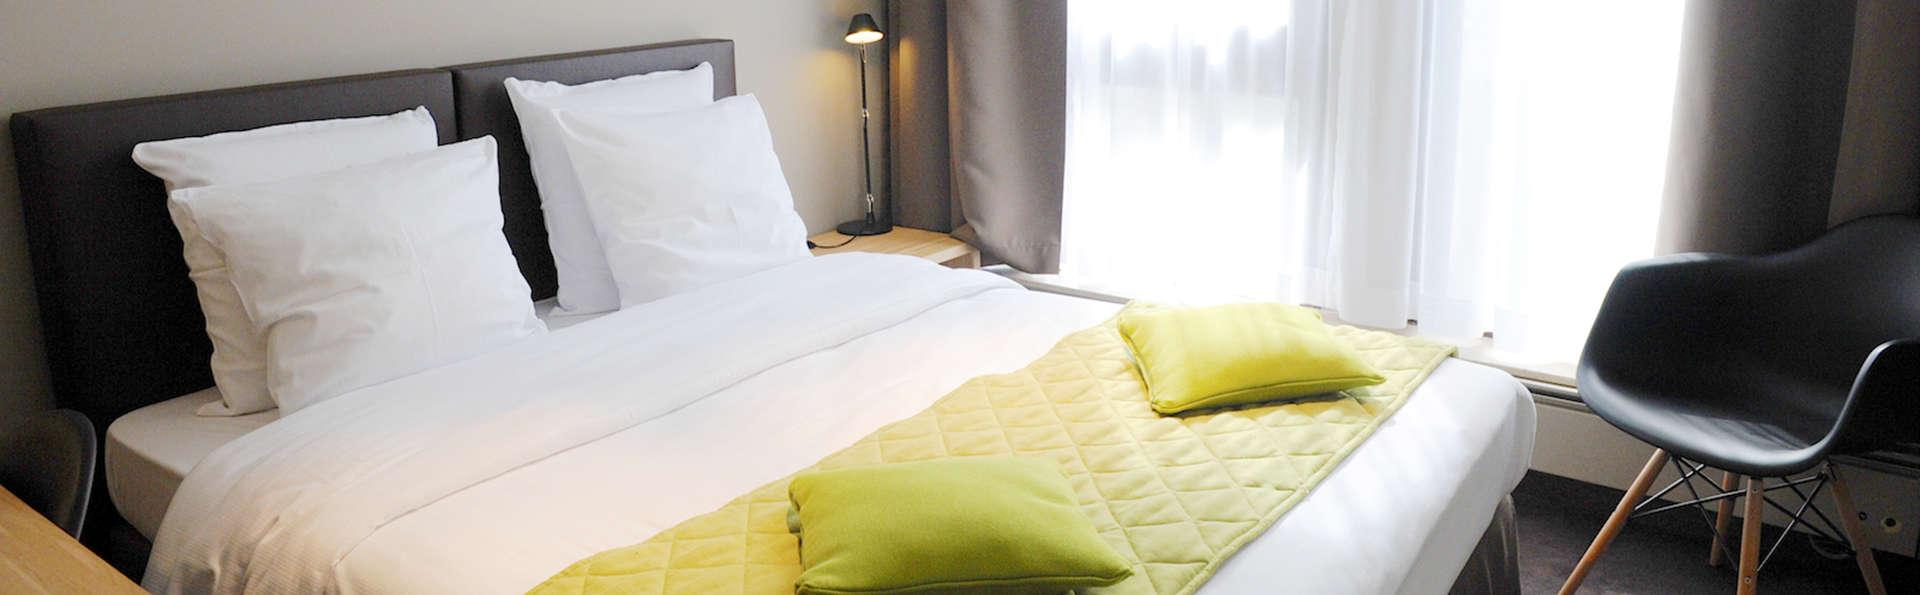 Hotel Chelton - EDIT_Room10.jpg